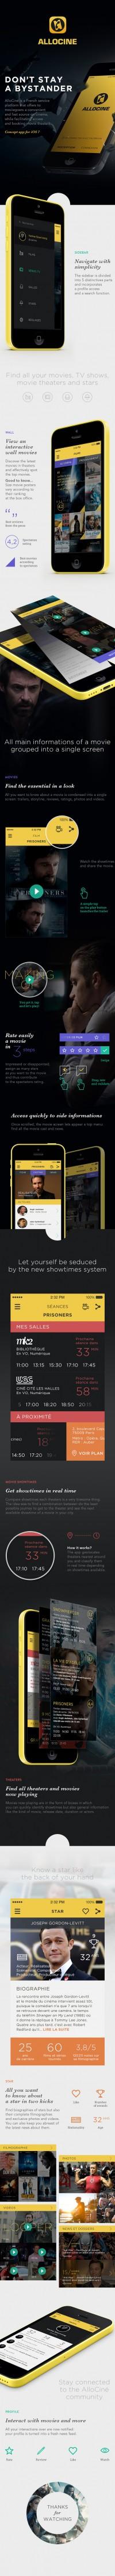 App-nomal Design / AlloCine - Concept Mobile app — Designspiration